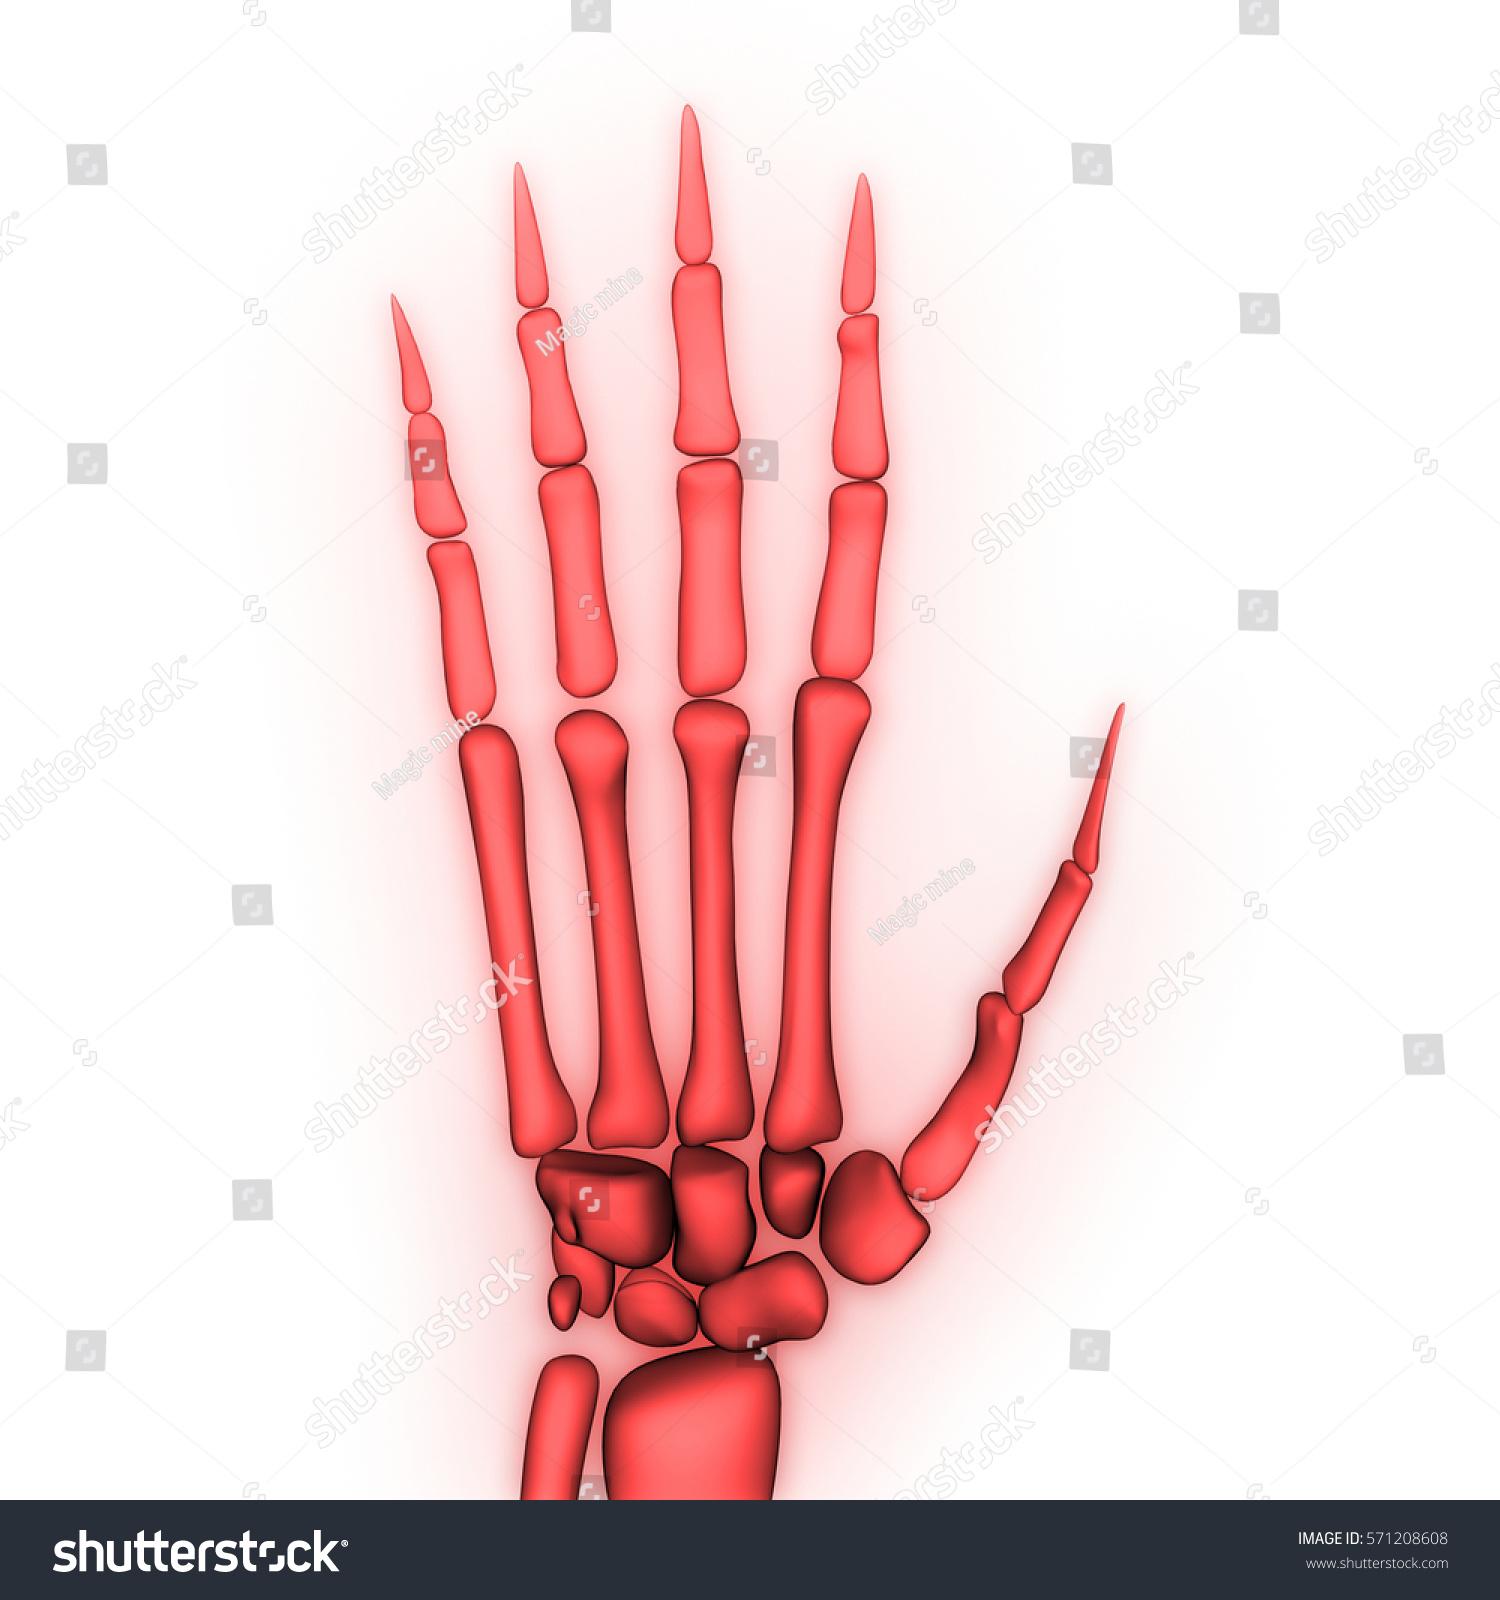 Human Body Bone Joint Pains Anatomy Stock Illustration 571208608 ...